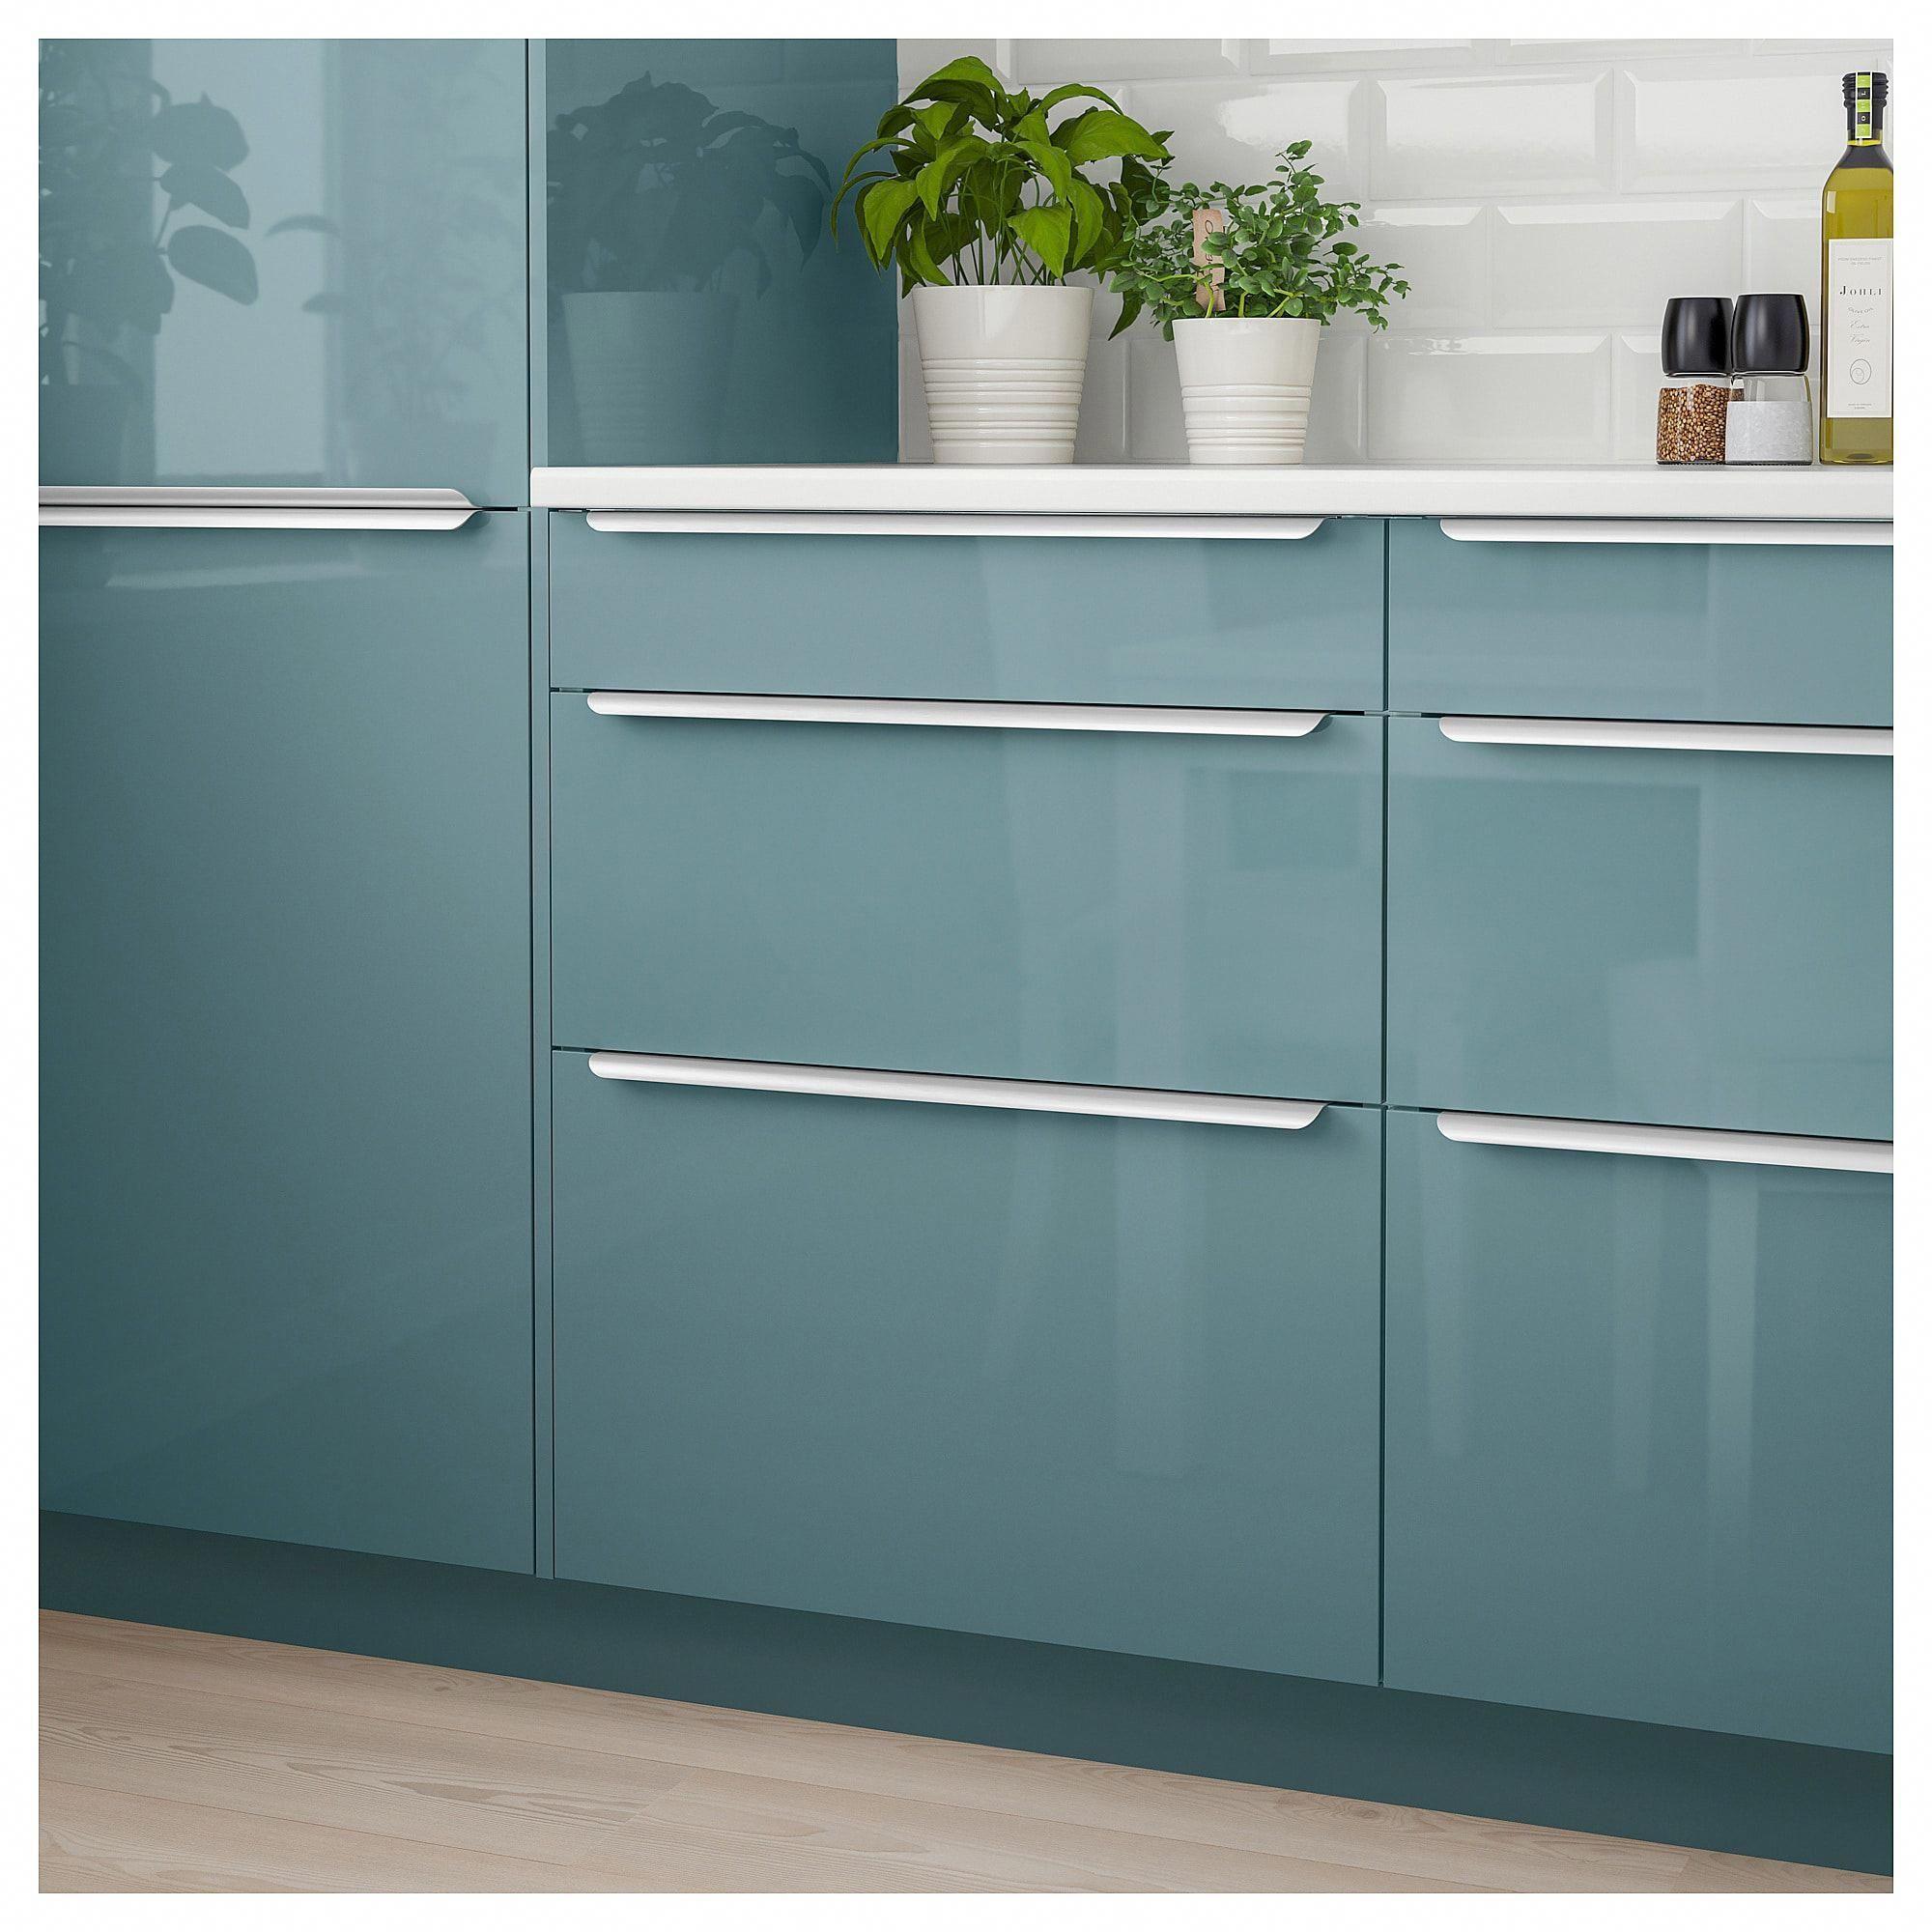 Best Ikea Kallarp High Gloss Gray Turquoise Drawer Front 400 x 300